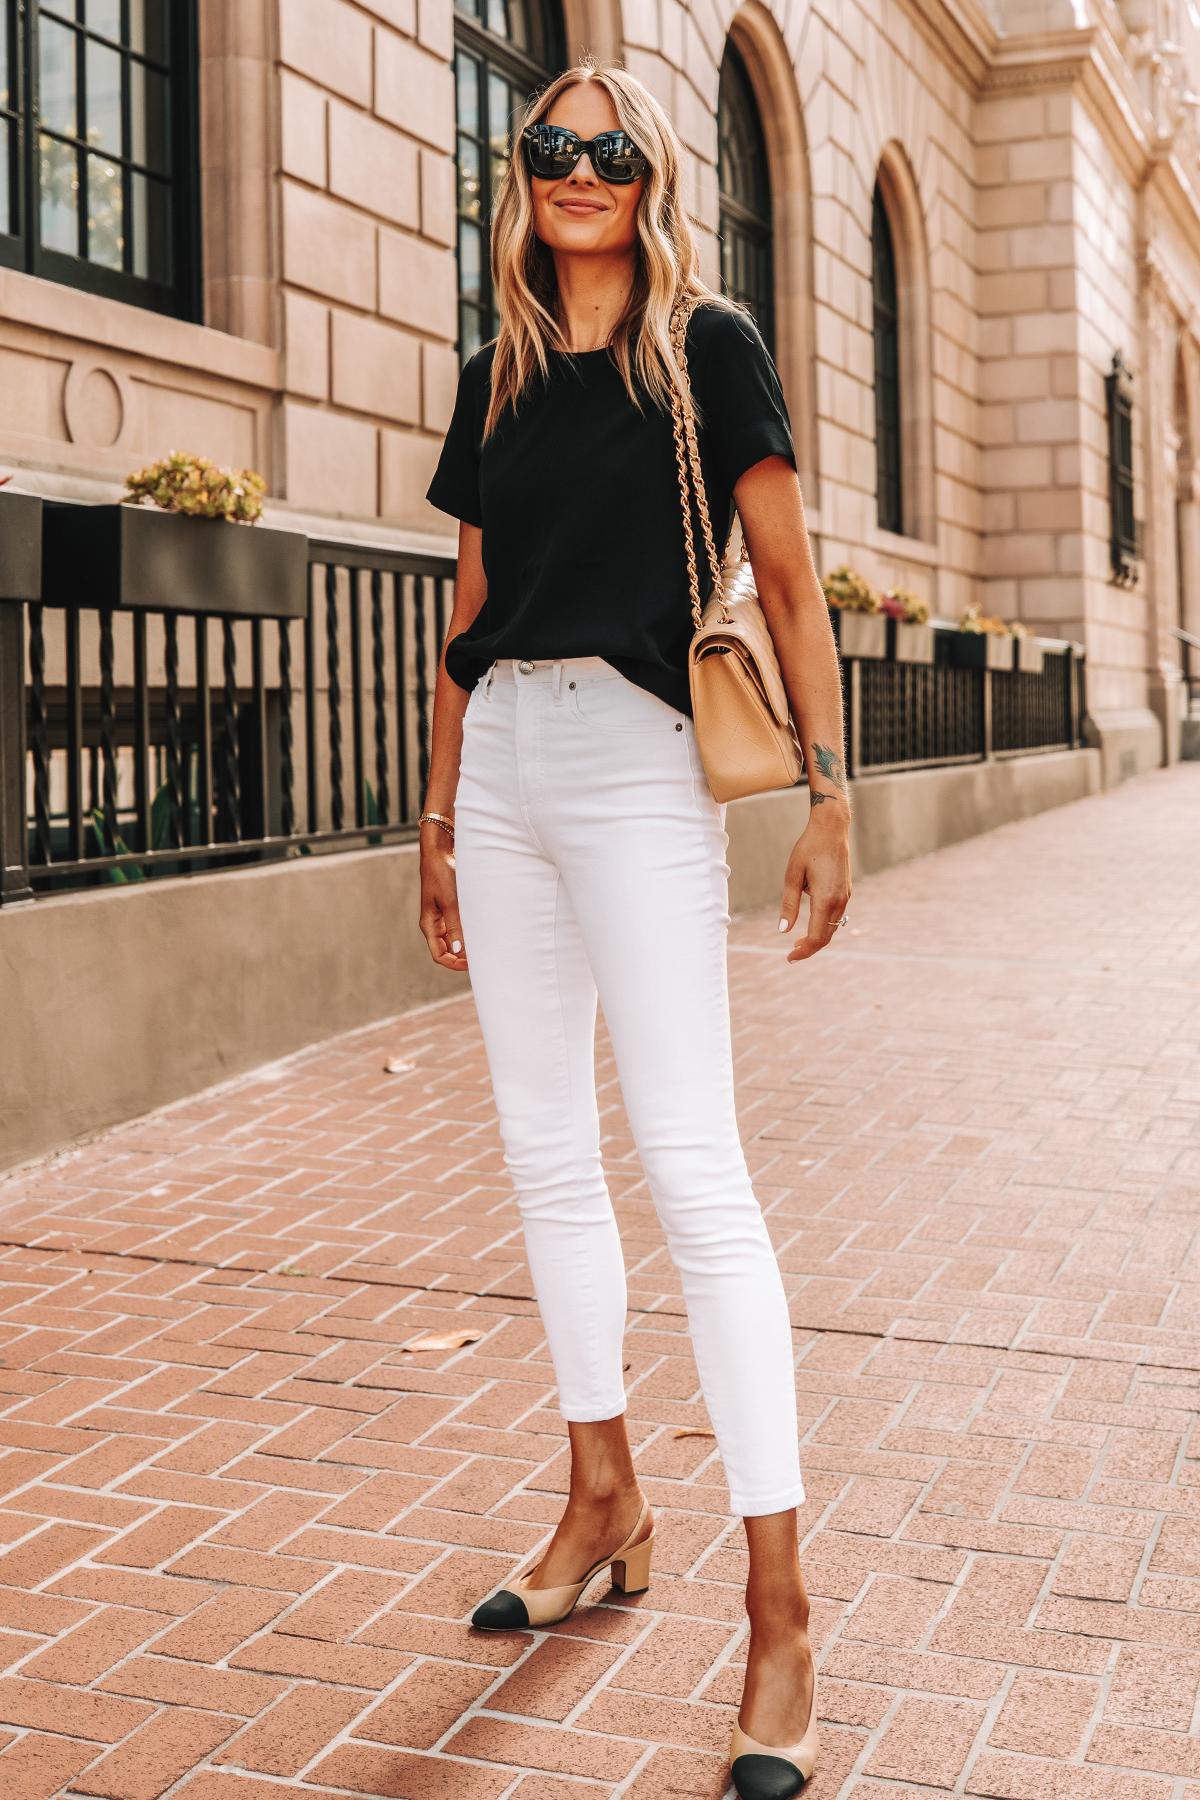 Fashion Jackson Wearing Everlane Black Short Sleeve Top Everlane White High Rise Skinny Jeans Chanel Slingbacks Chanel Beige Handbag 1